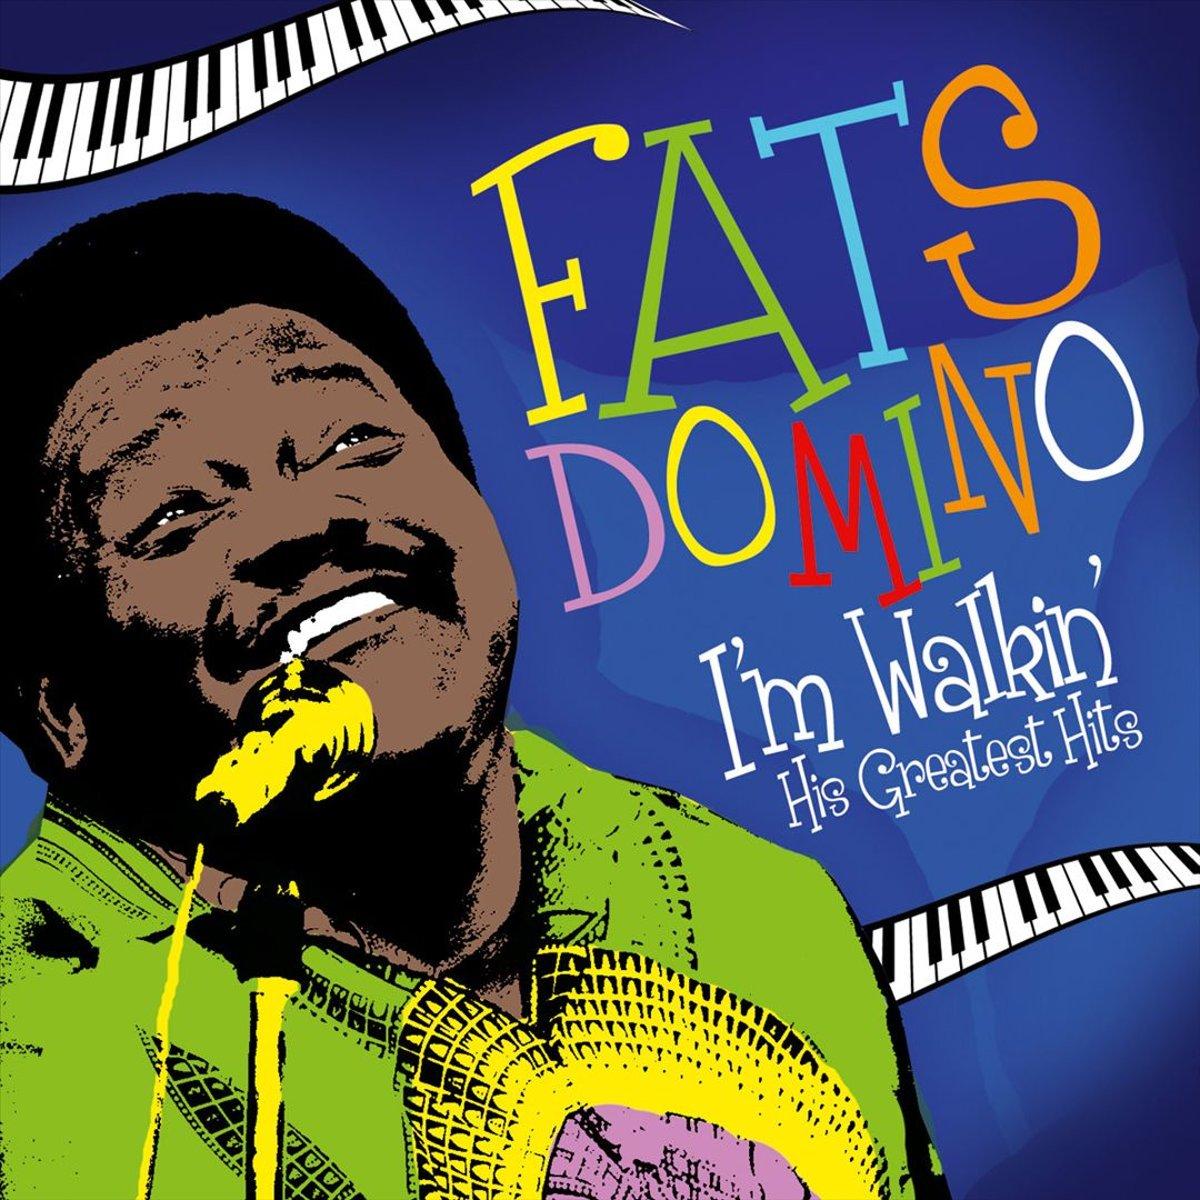 Фэтс Домино Fats Domino. Im Walkin - His Greatest Hits (LP)